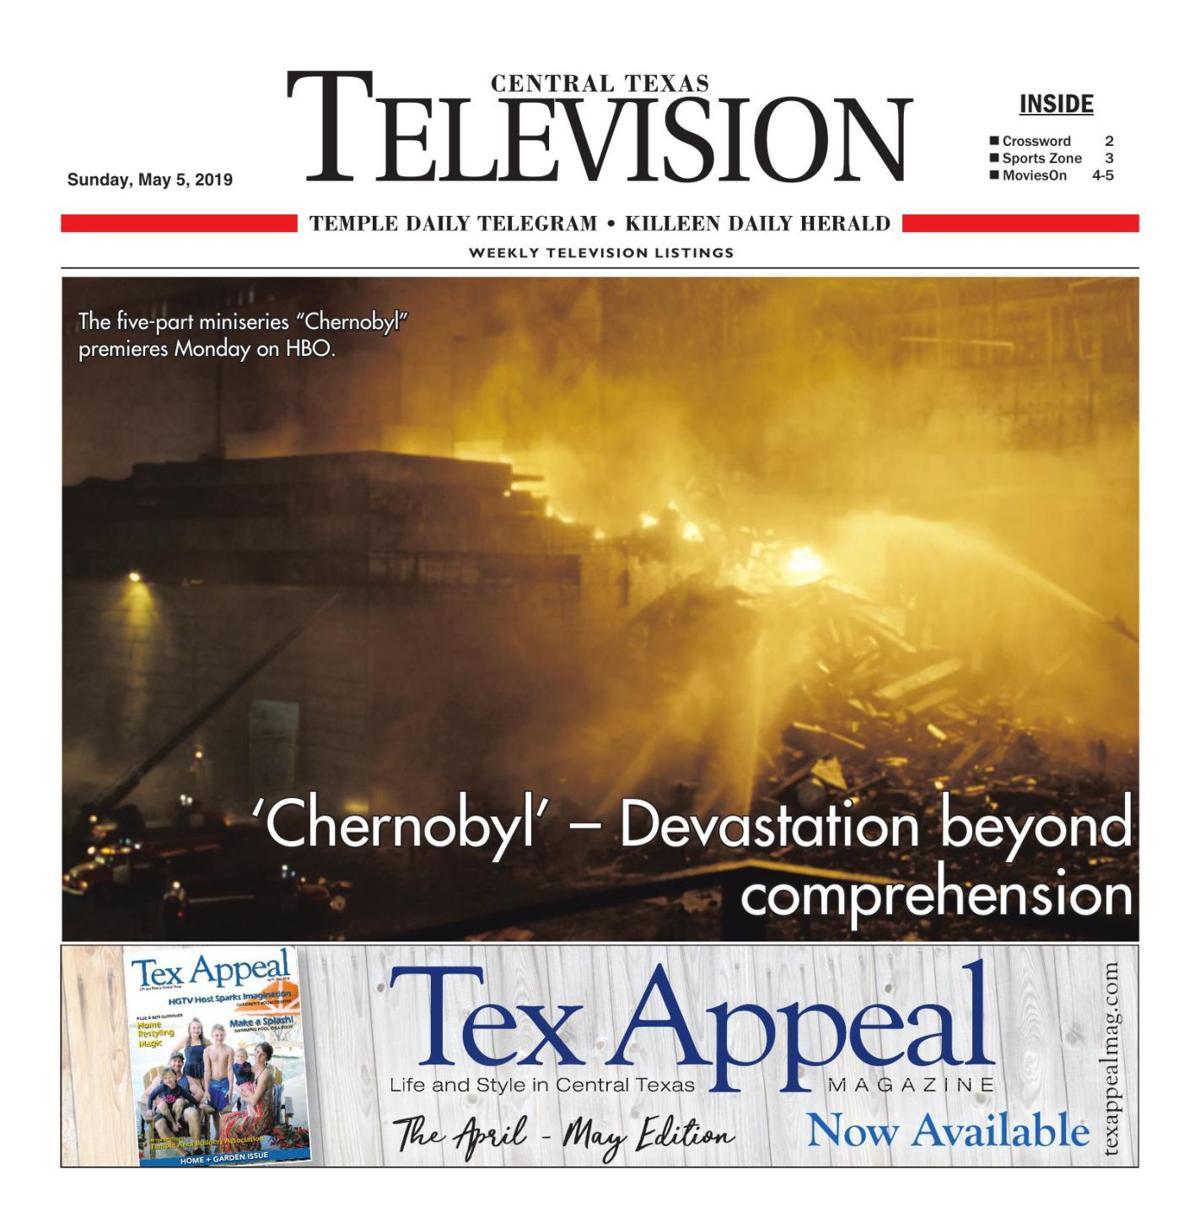 TV Book May 5th- 11th